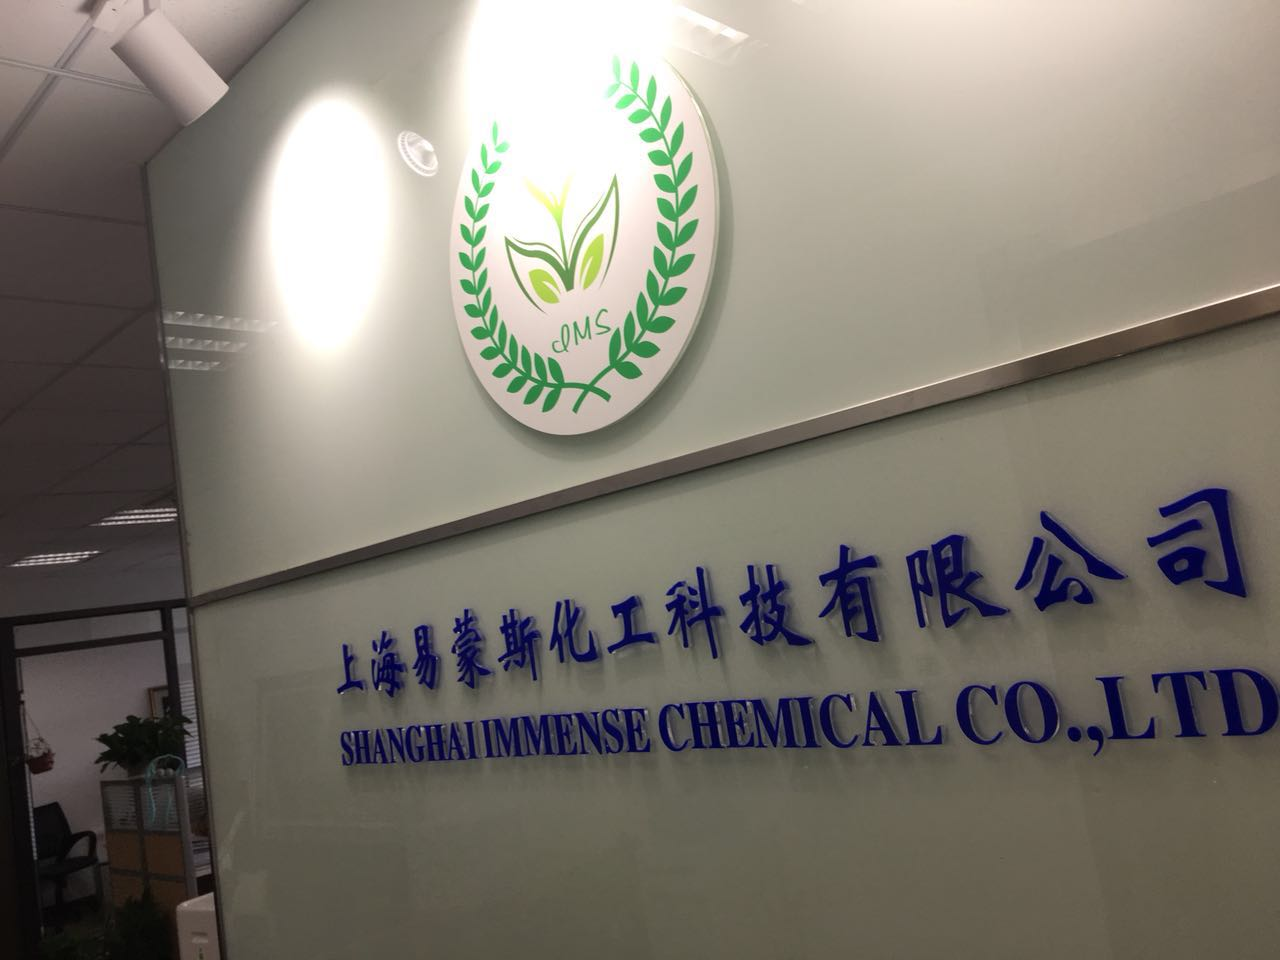 SHANGHAI IMMENSE CHEMICAL CO.,LTD.